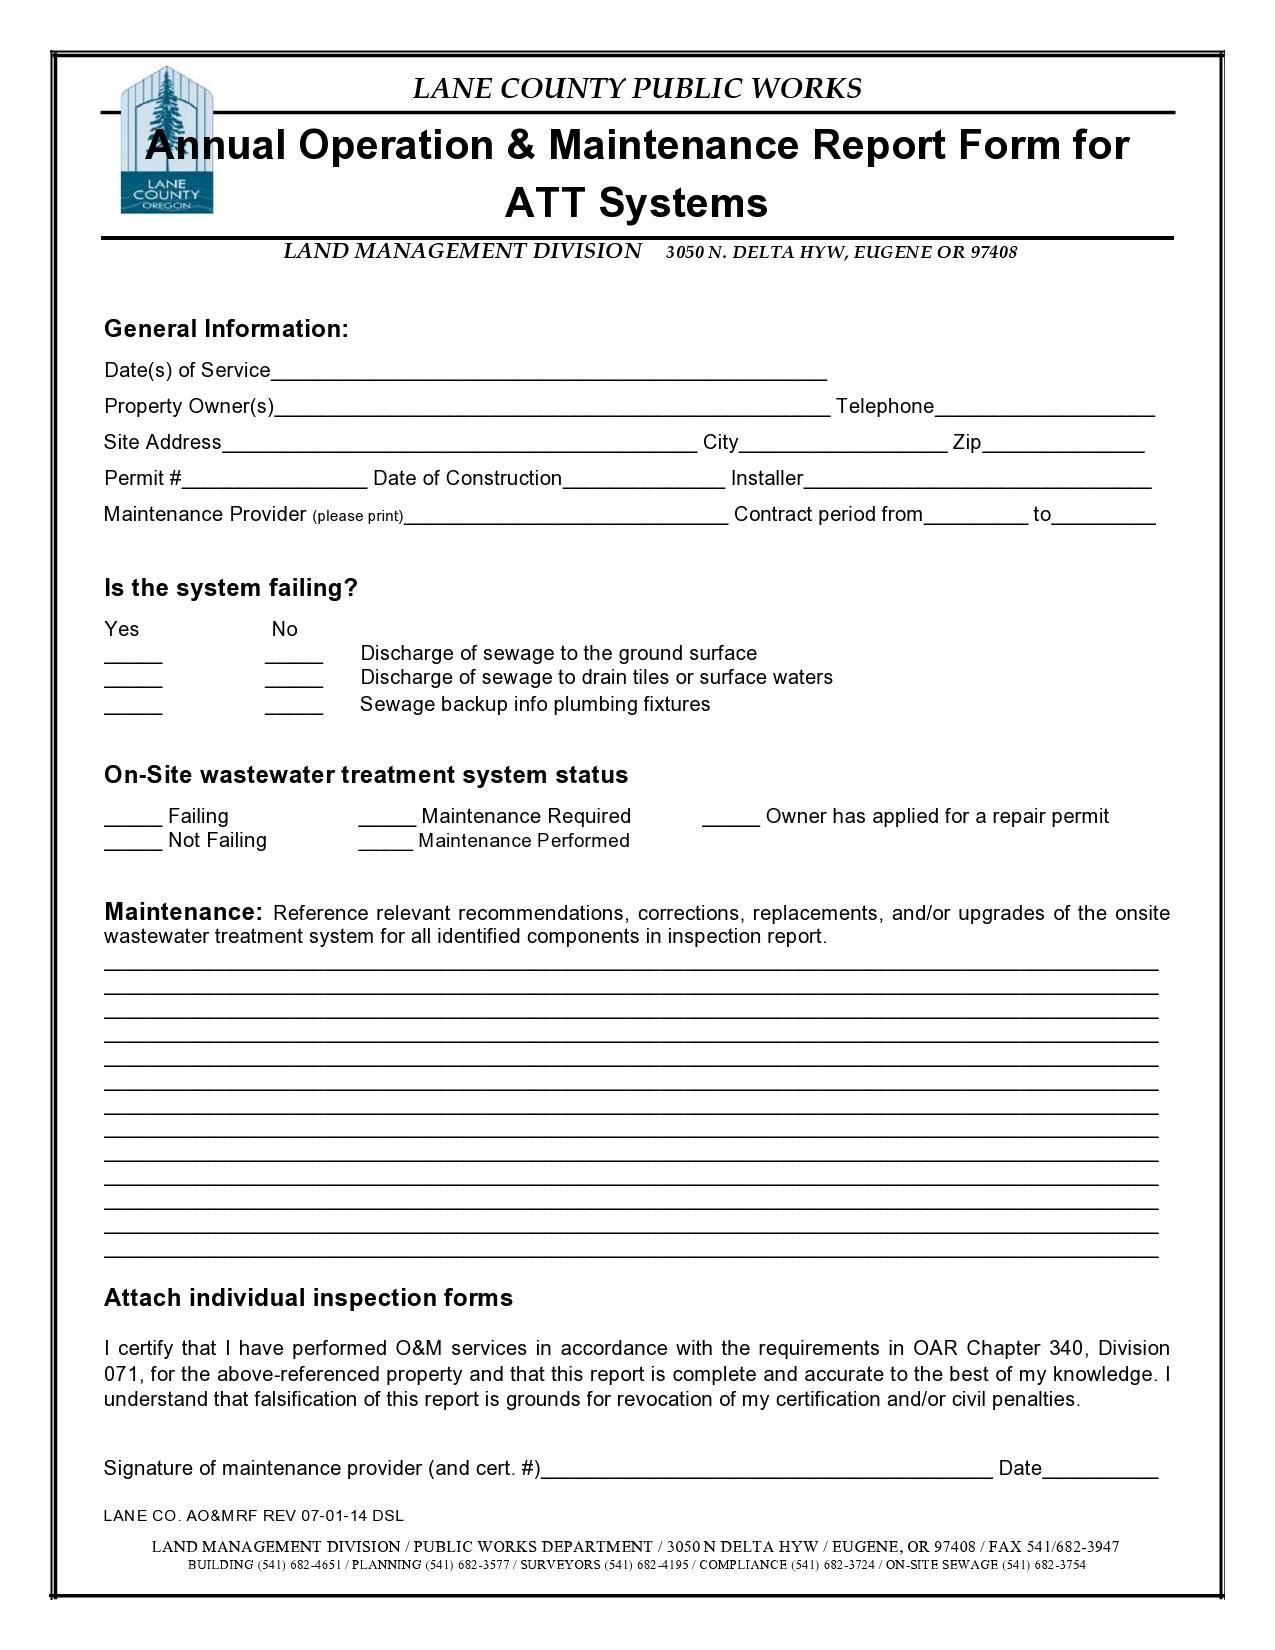 Free maintenance report form 21